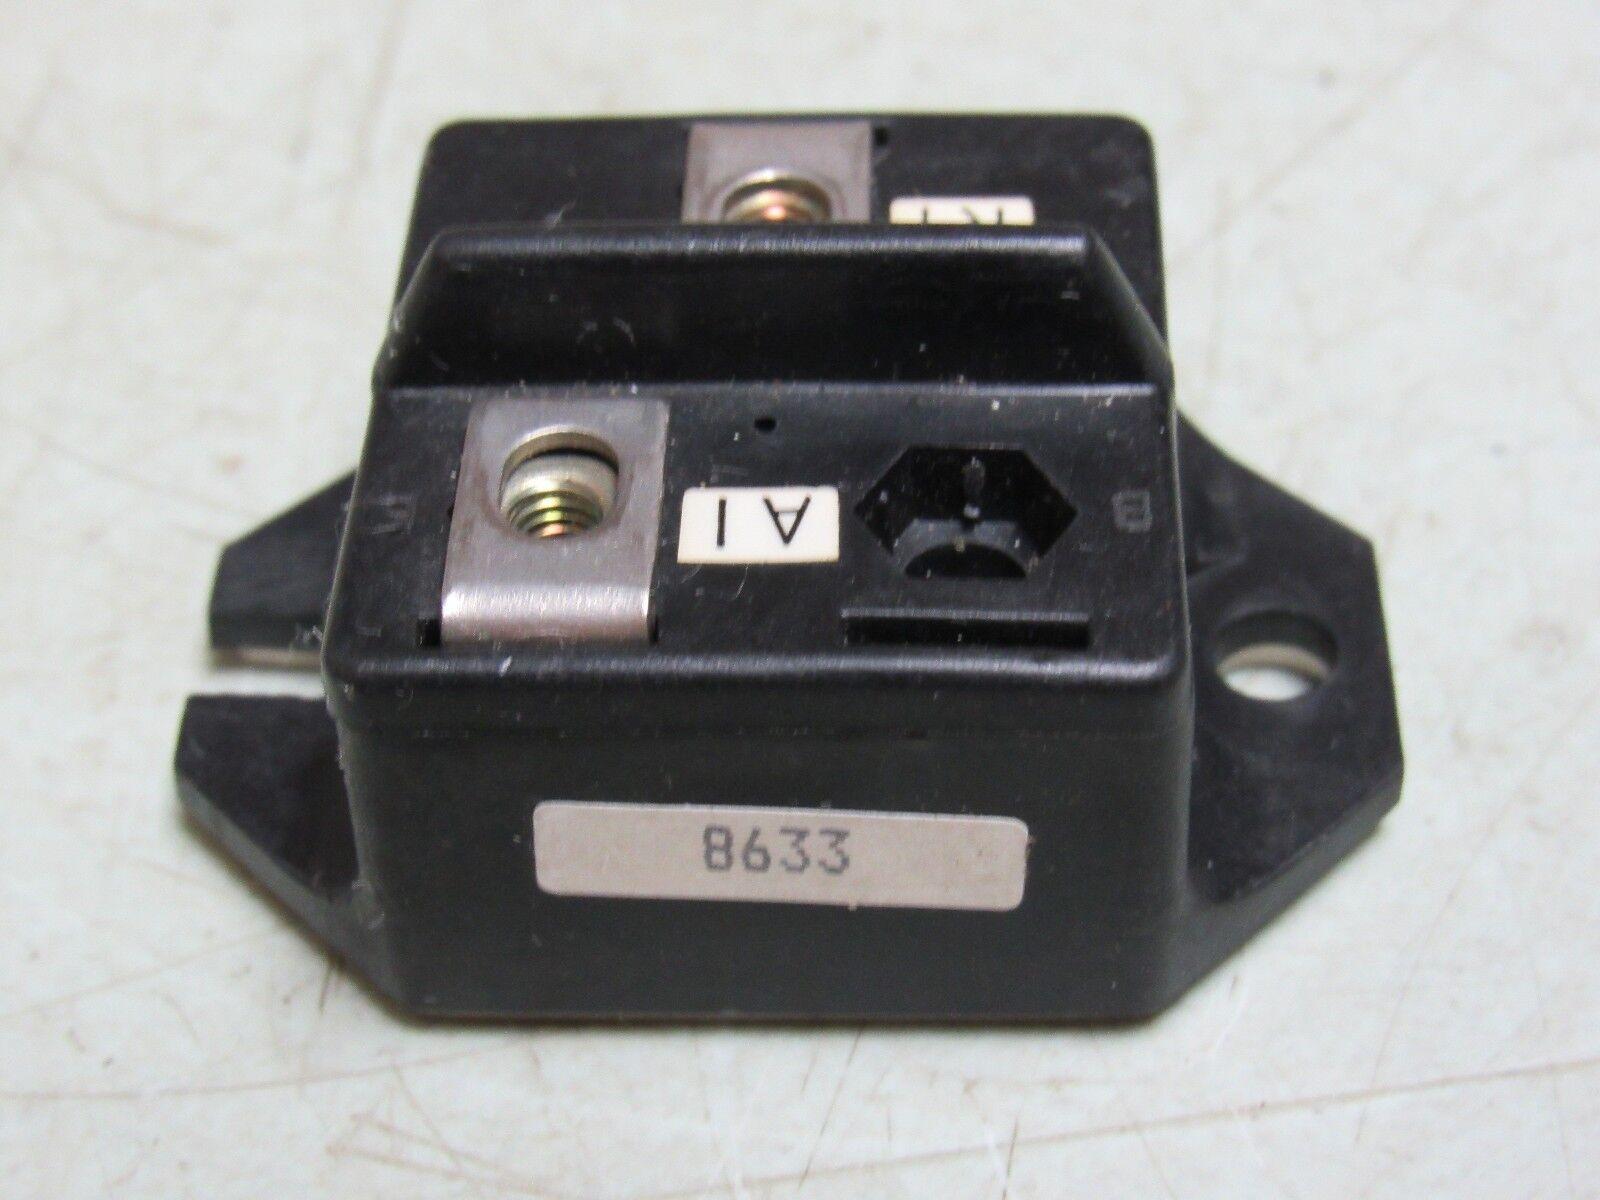 Mitsubishi Model Diode Sr50c 24 30 Day Ship Ebay Standard 1n4007 Vs Schottky 1n5819 Electronics Club Fans